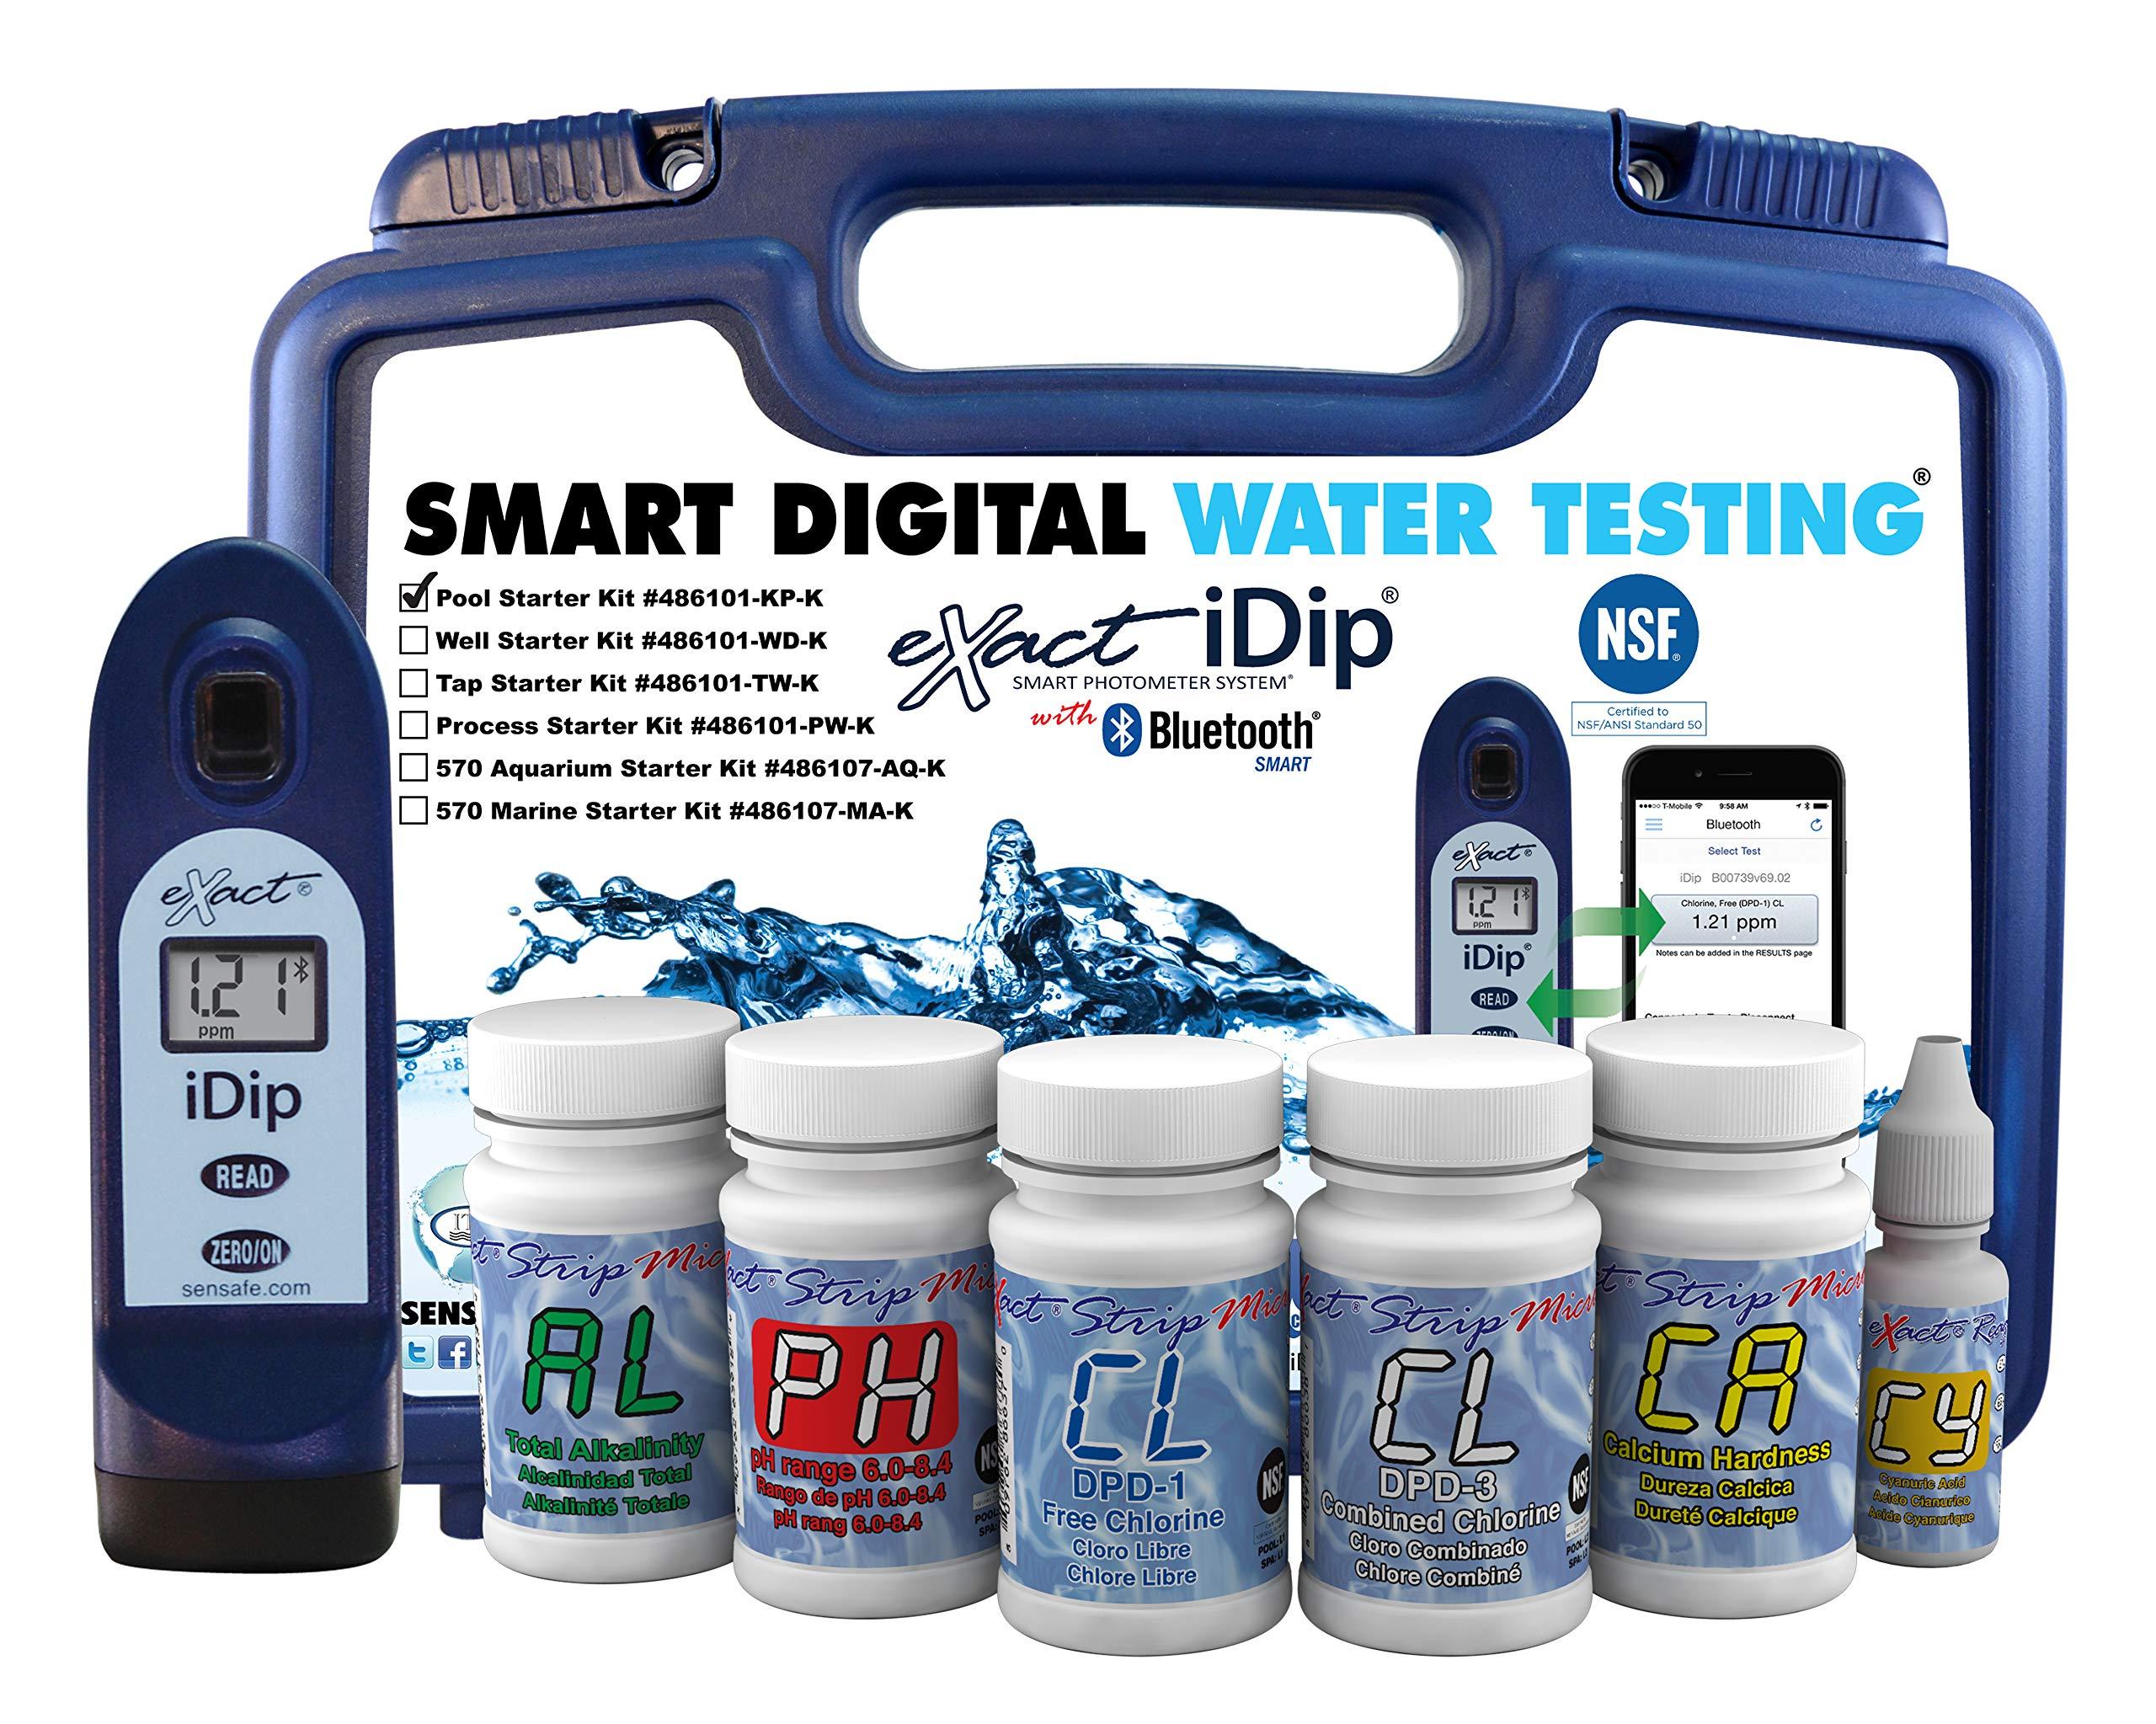 eXact iDip Photometer 486101-KP-K Pool Starter Kit with Meter by Exact